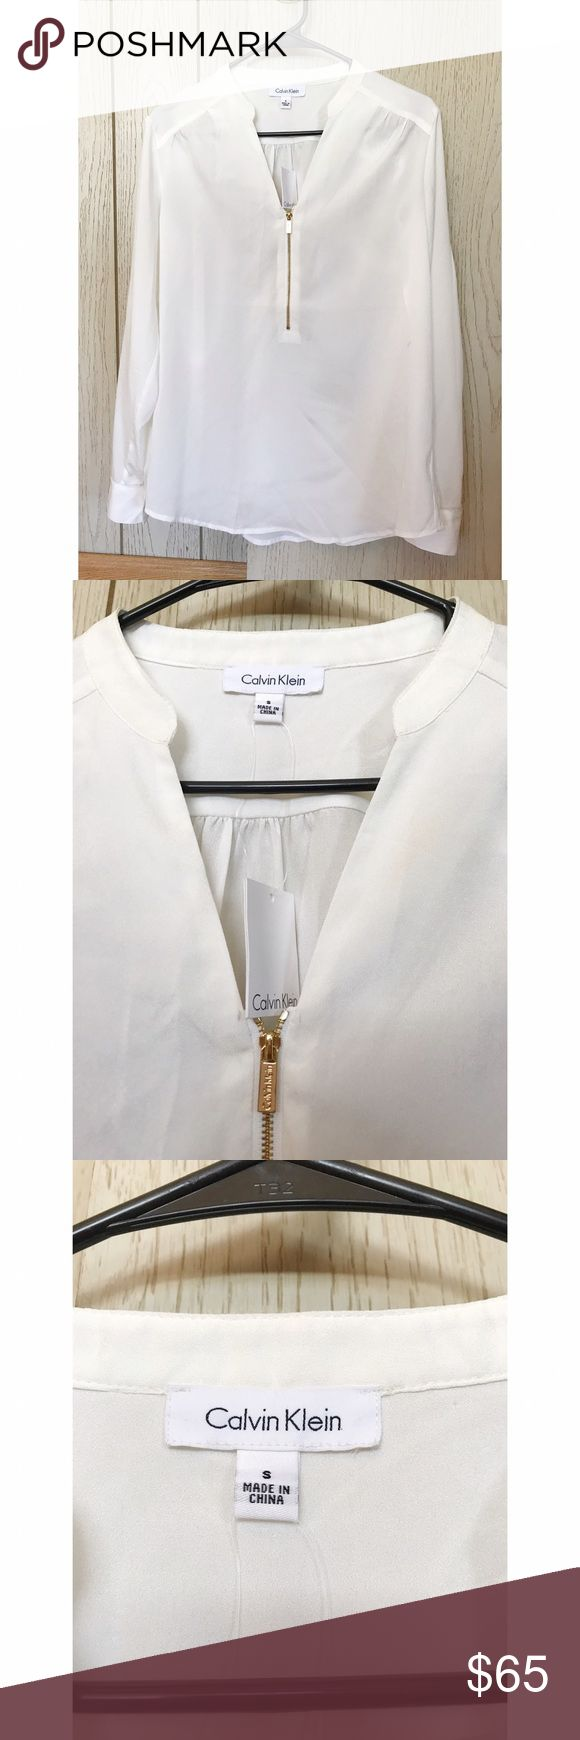 Calvin Klein White Button Down With Gold Details Small Calvin Klein Tops Button Down Shirts